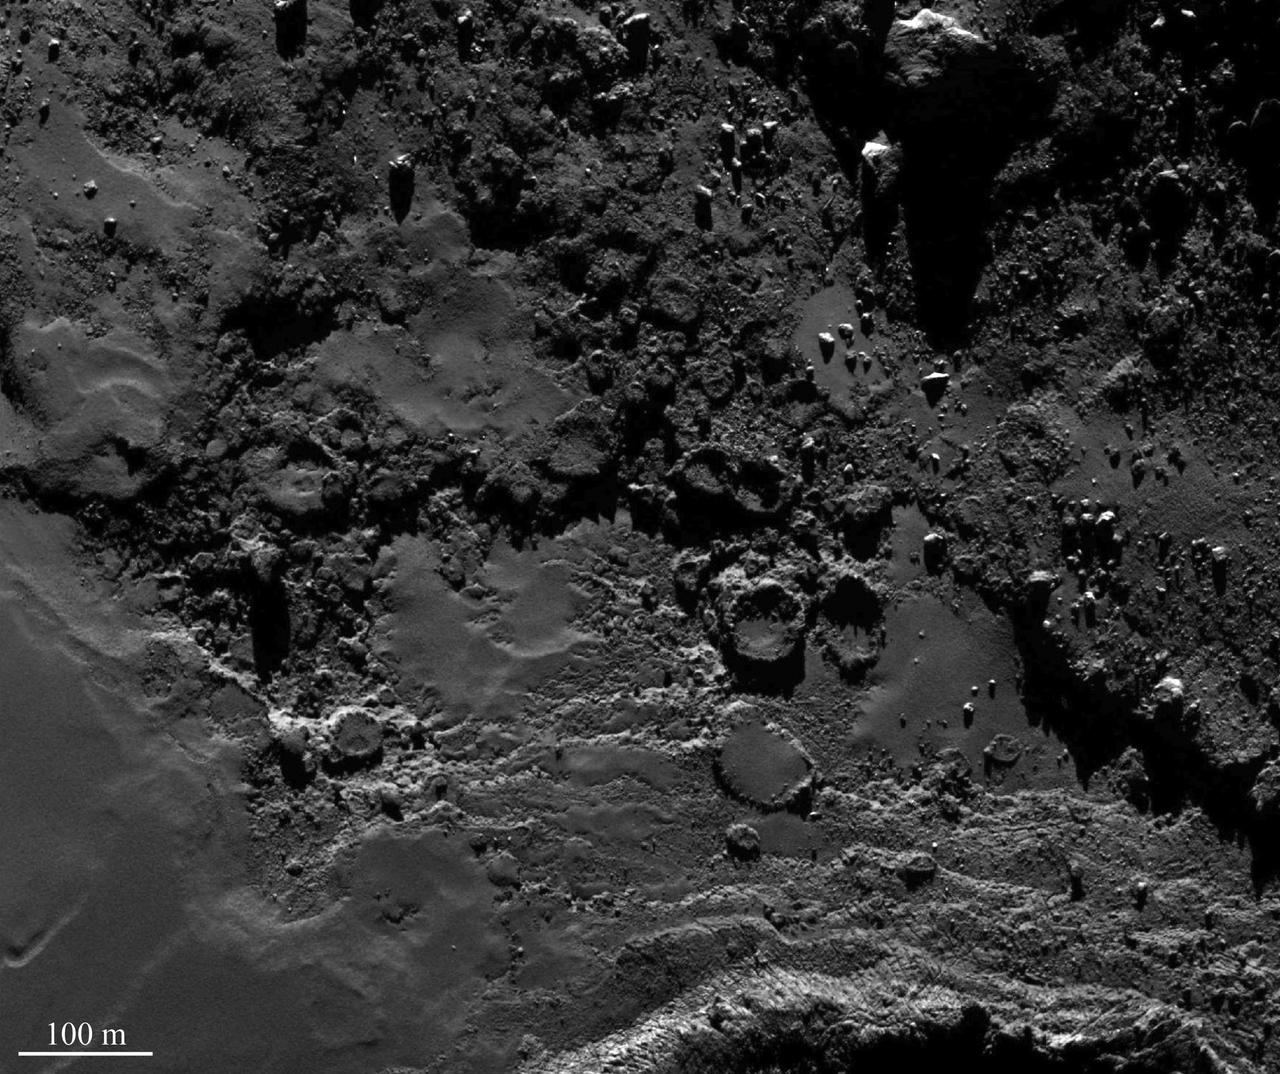 1567215879854-Rosetta_OSIRIS_NAC_67P_Round_features_in_Imhotep_a_1280.jpg